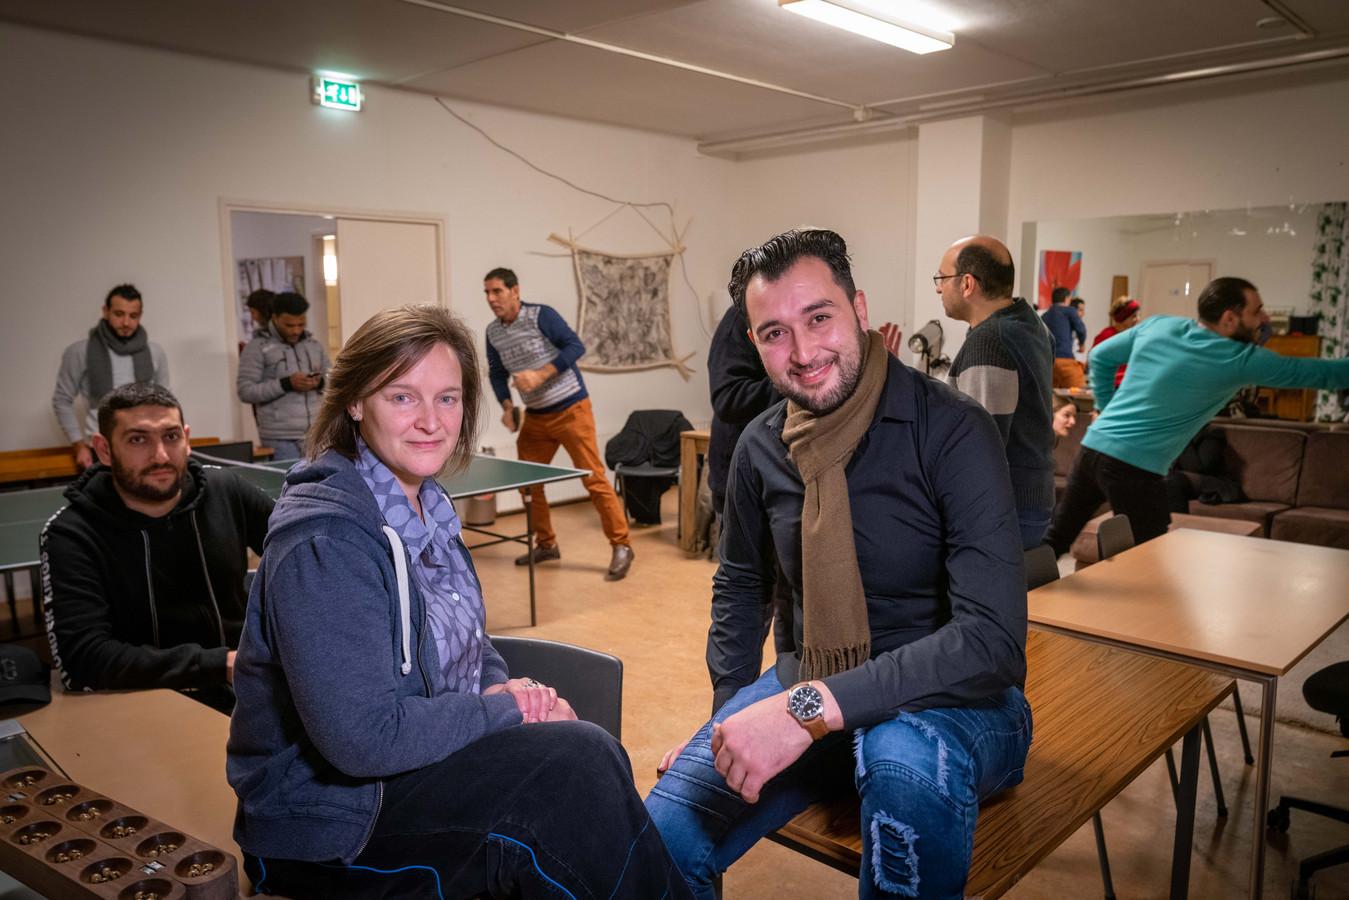 Coördinatoren van het Buddycafé: Dunja van Hensbergen (L) en Mahmoud Shikhali.